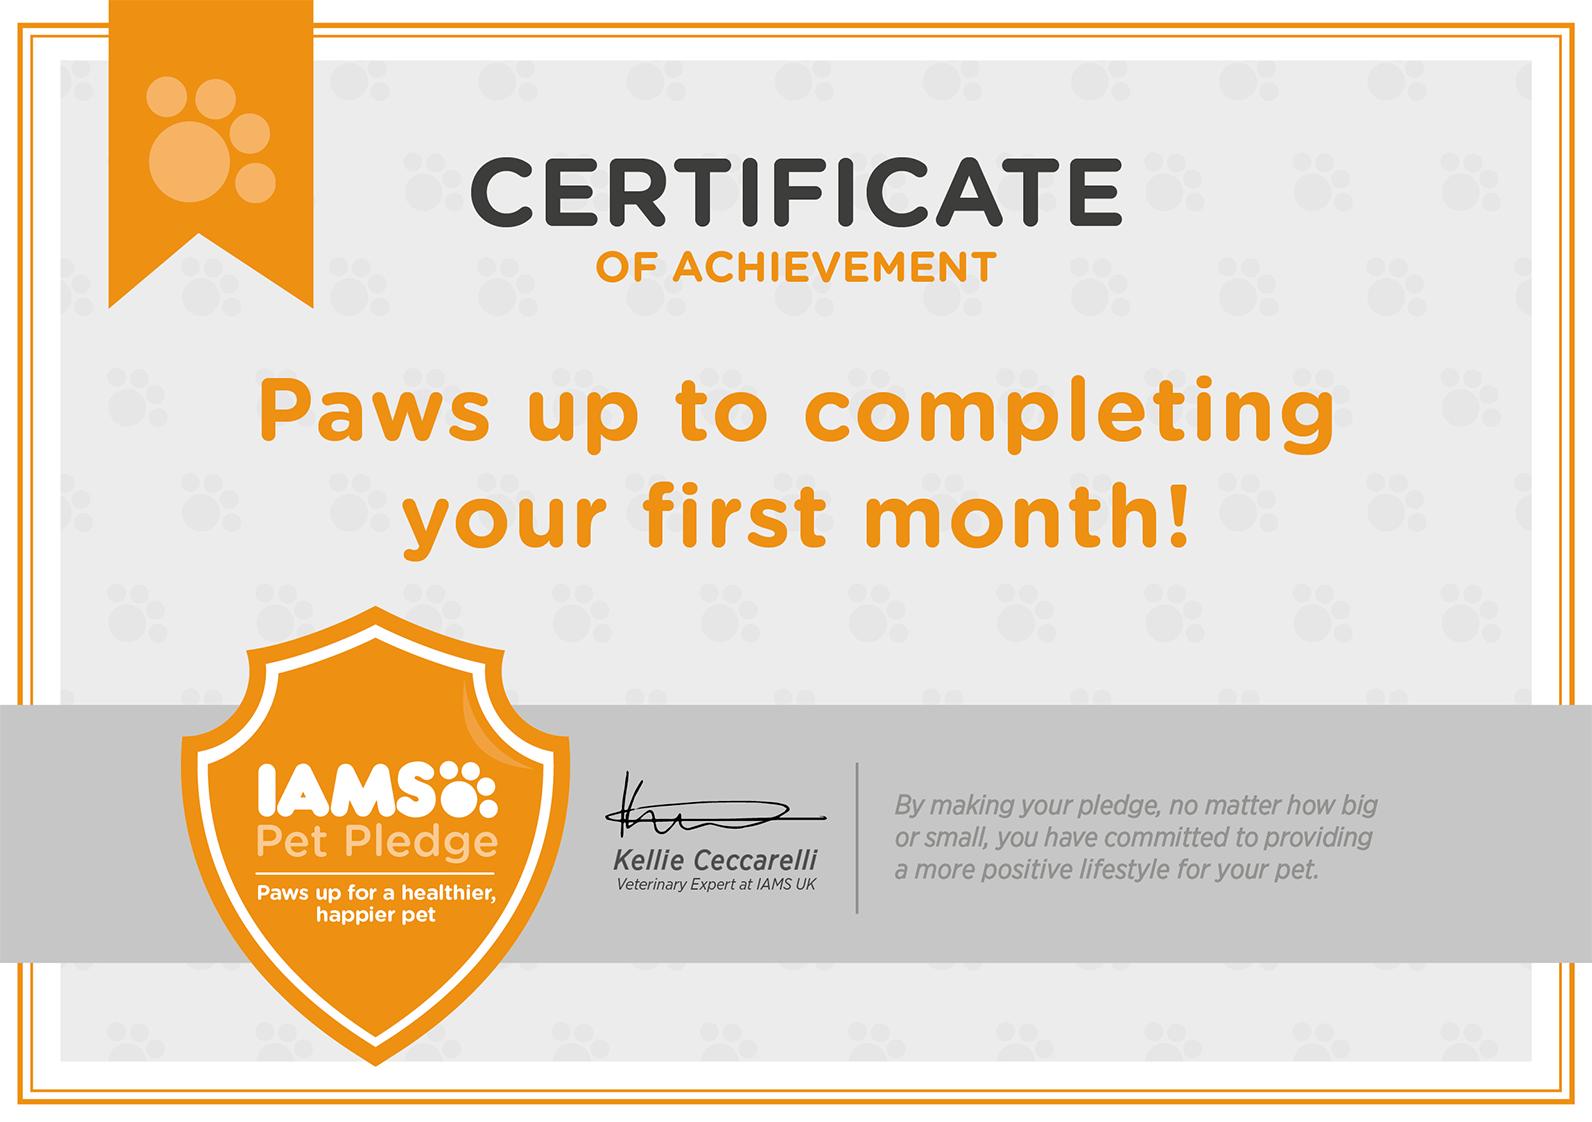 IAMS pet pledge